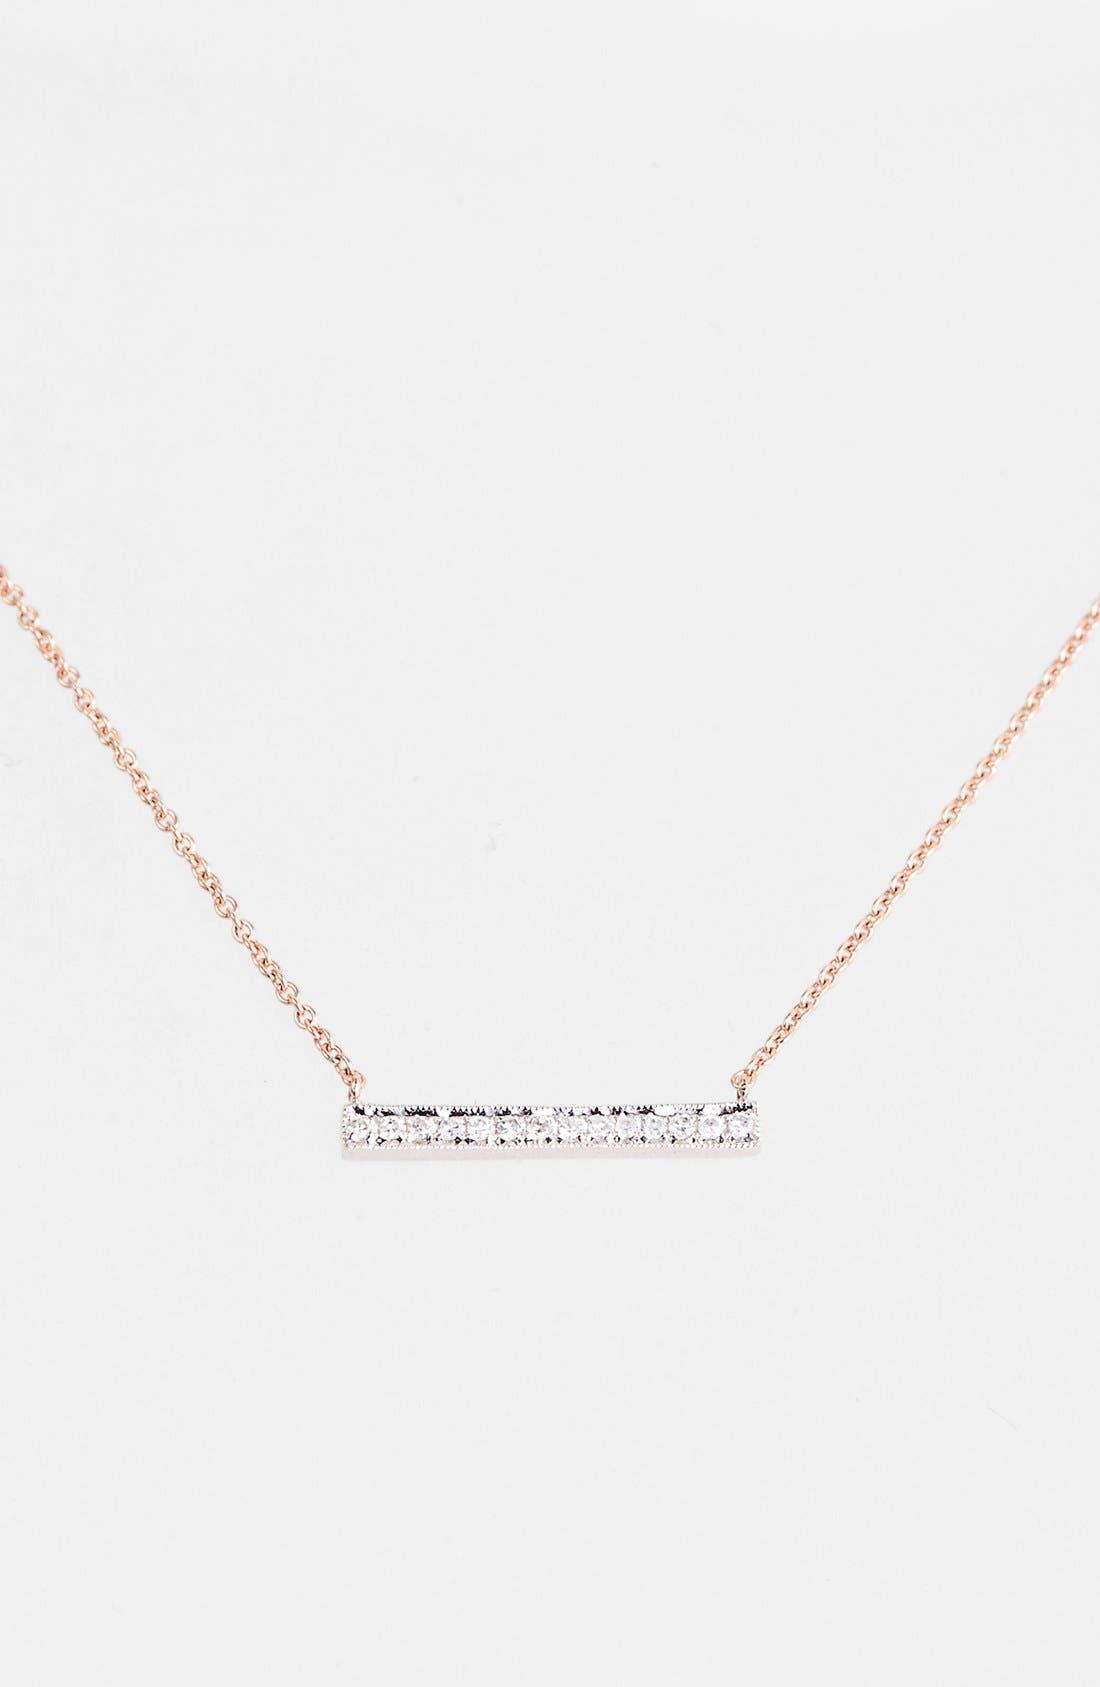 Main Image - Dana Rebecca Designs 'Sylvie Rose' Medium Diamond Bar Pendant Necklace